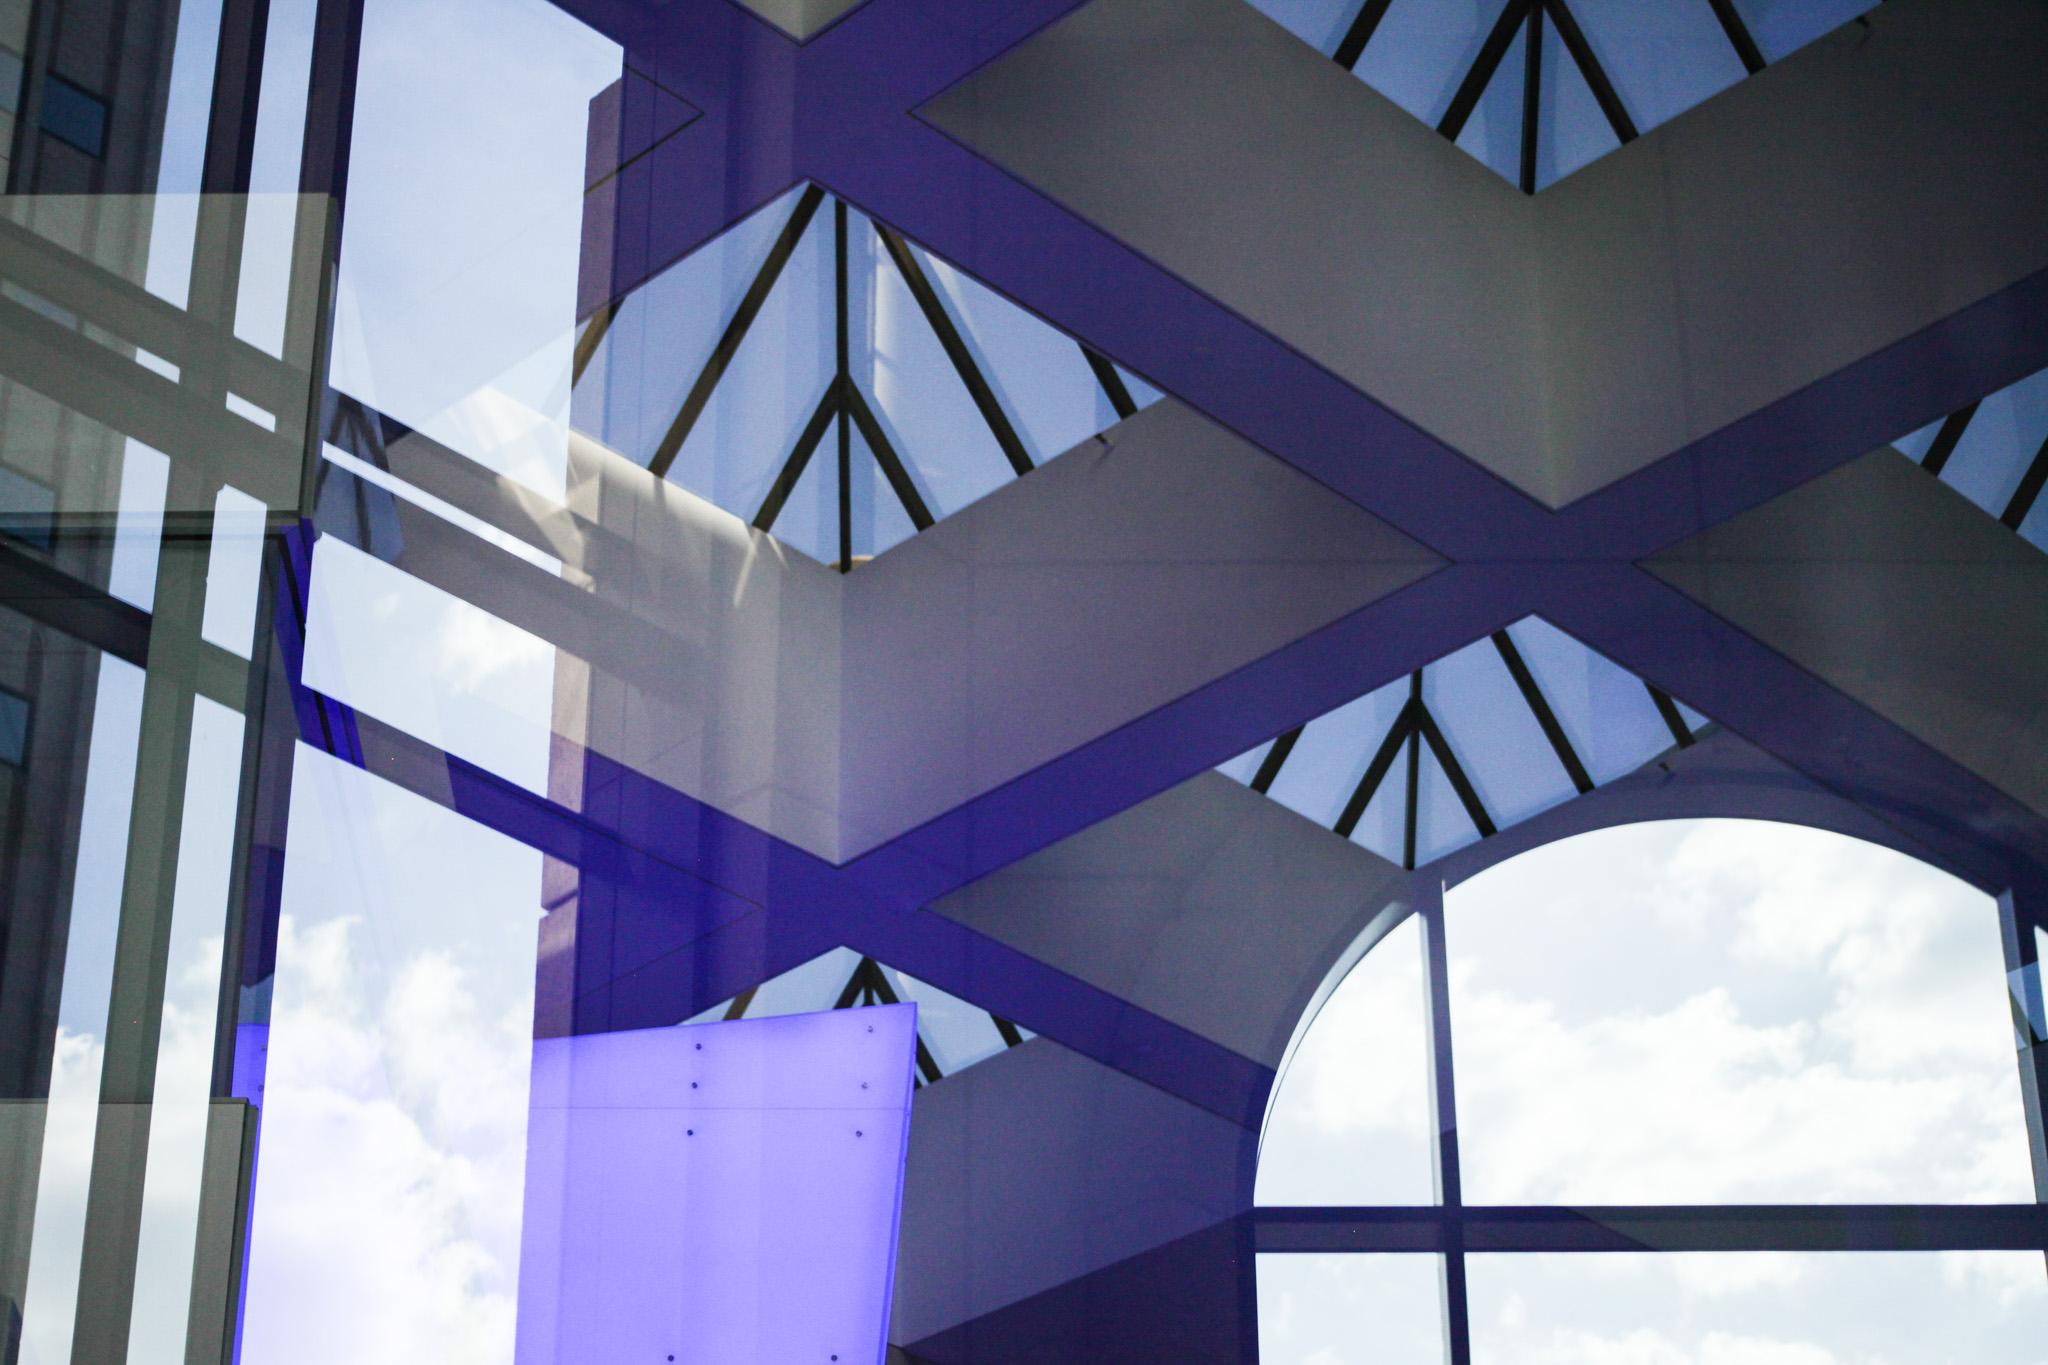 A blue art installation reflects across the windows the BBVA branch.